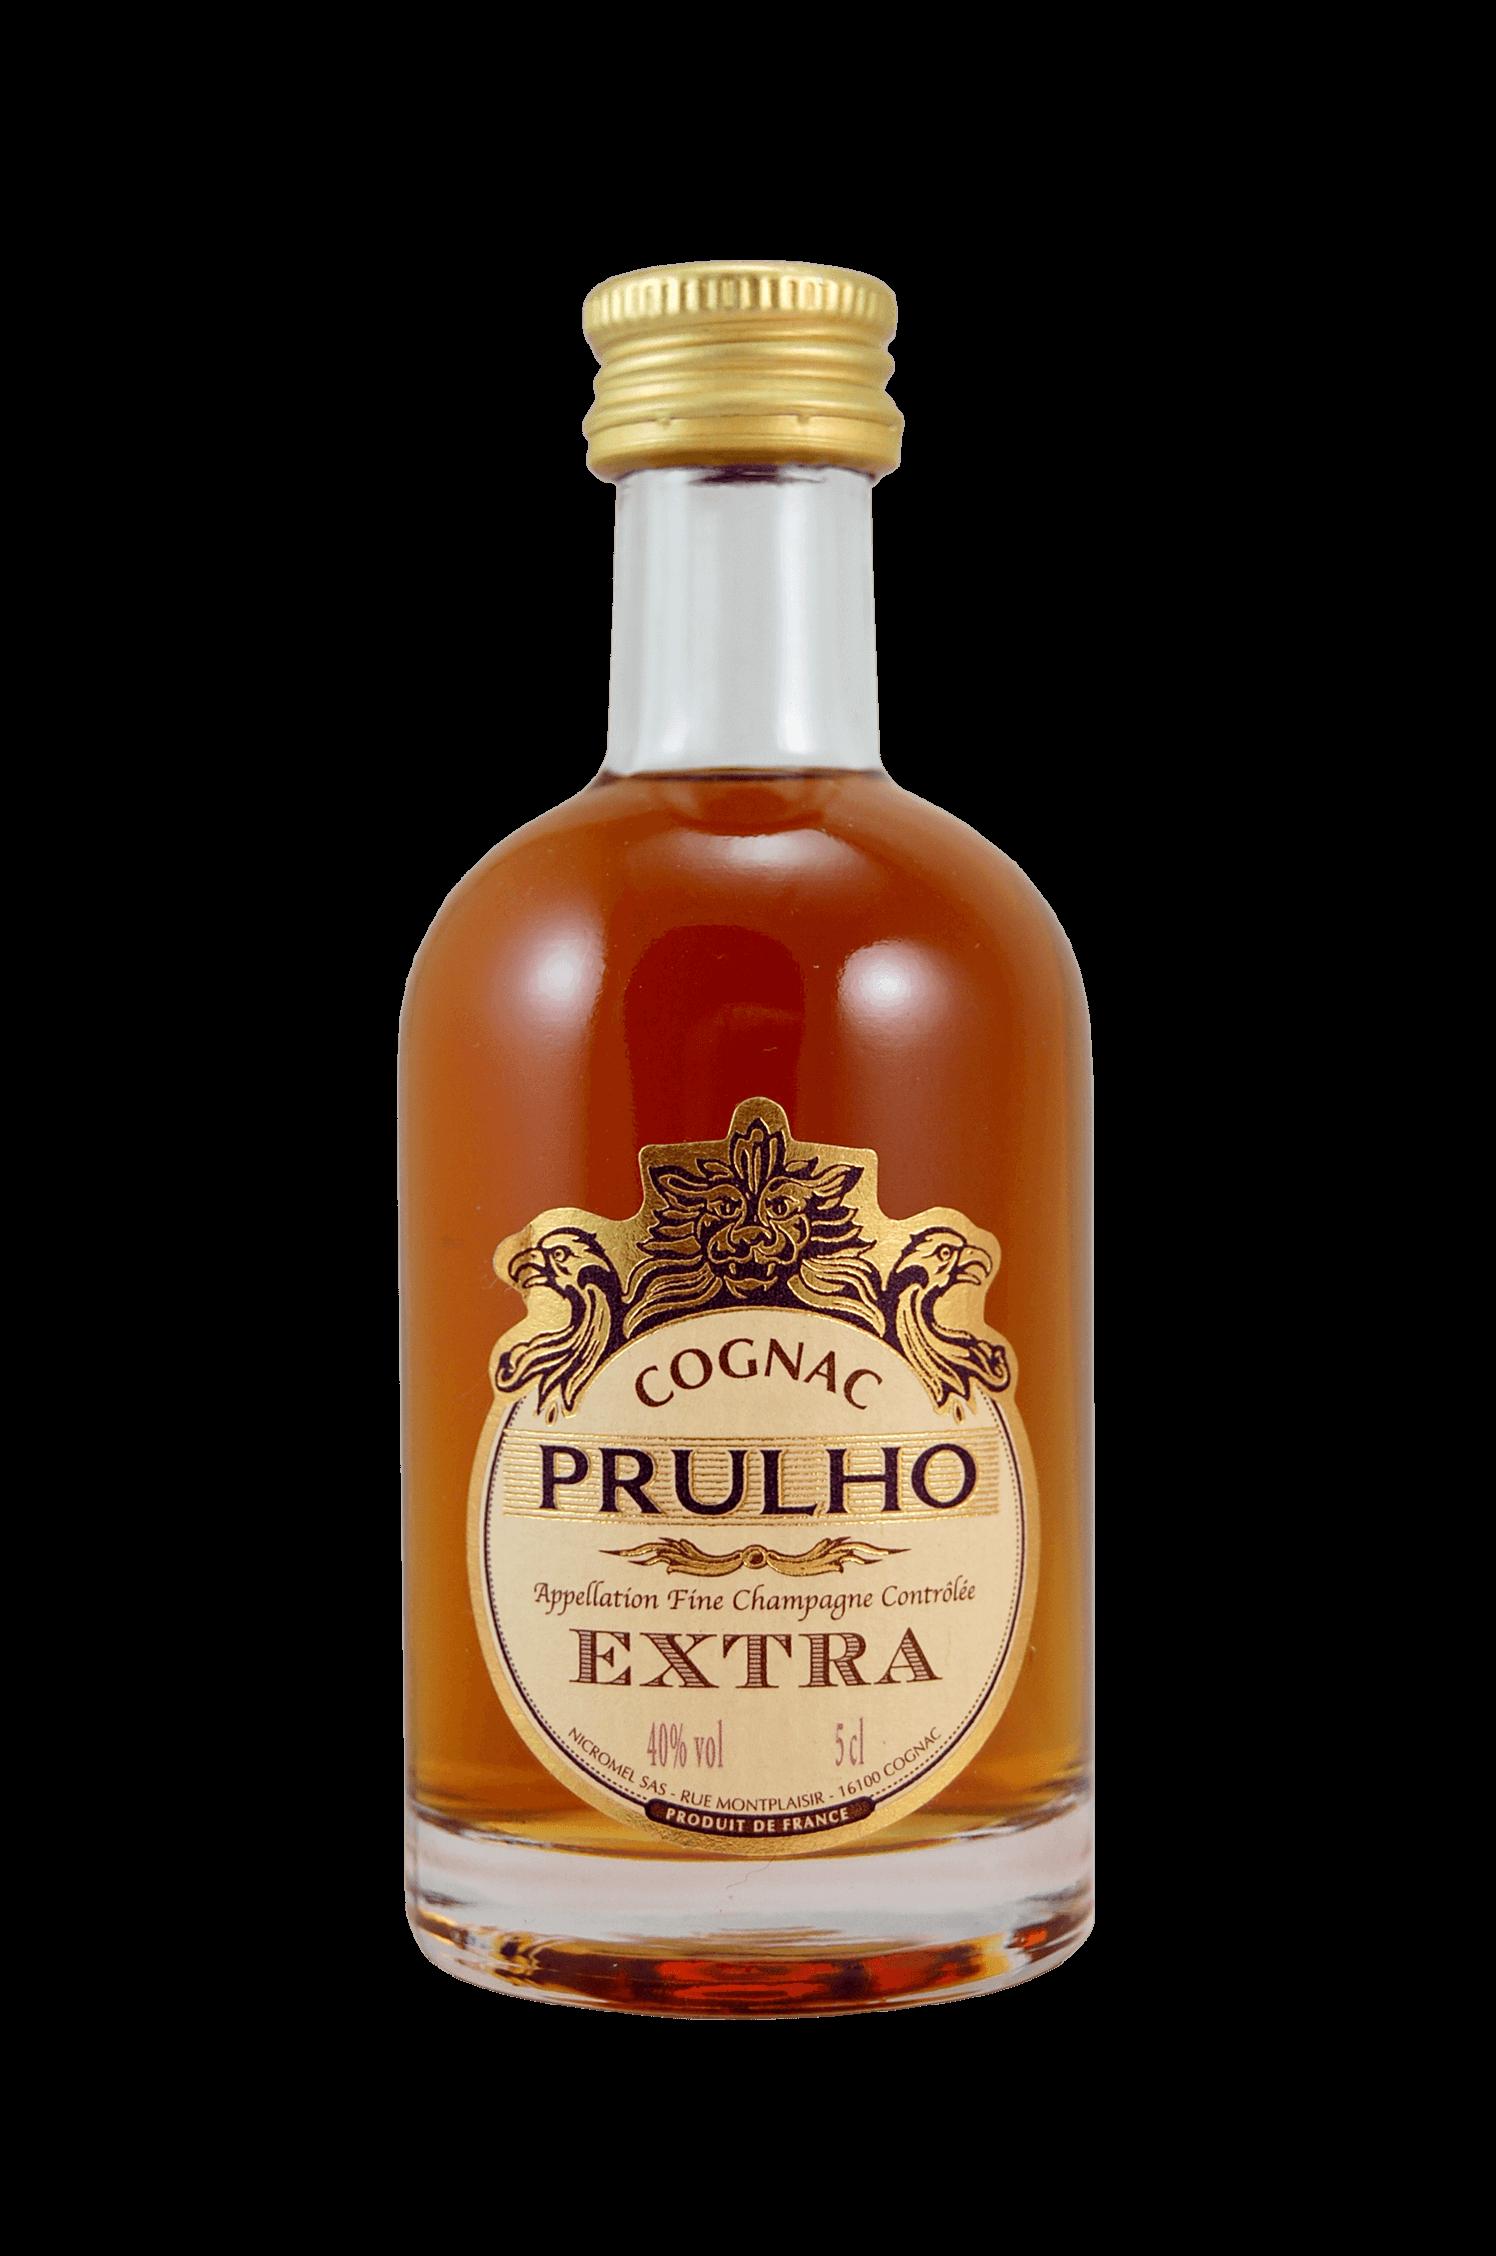 Cognac Pruhlo Extra